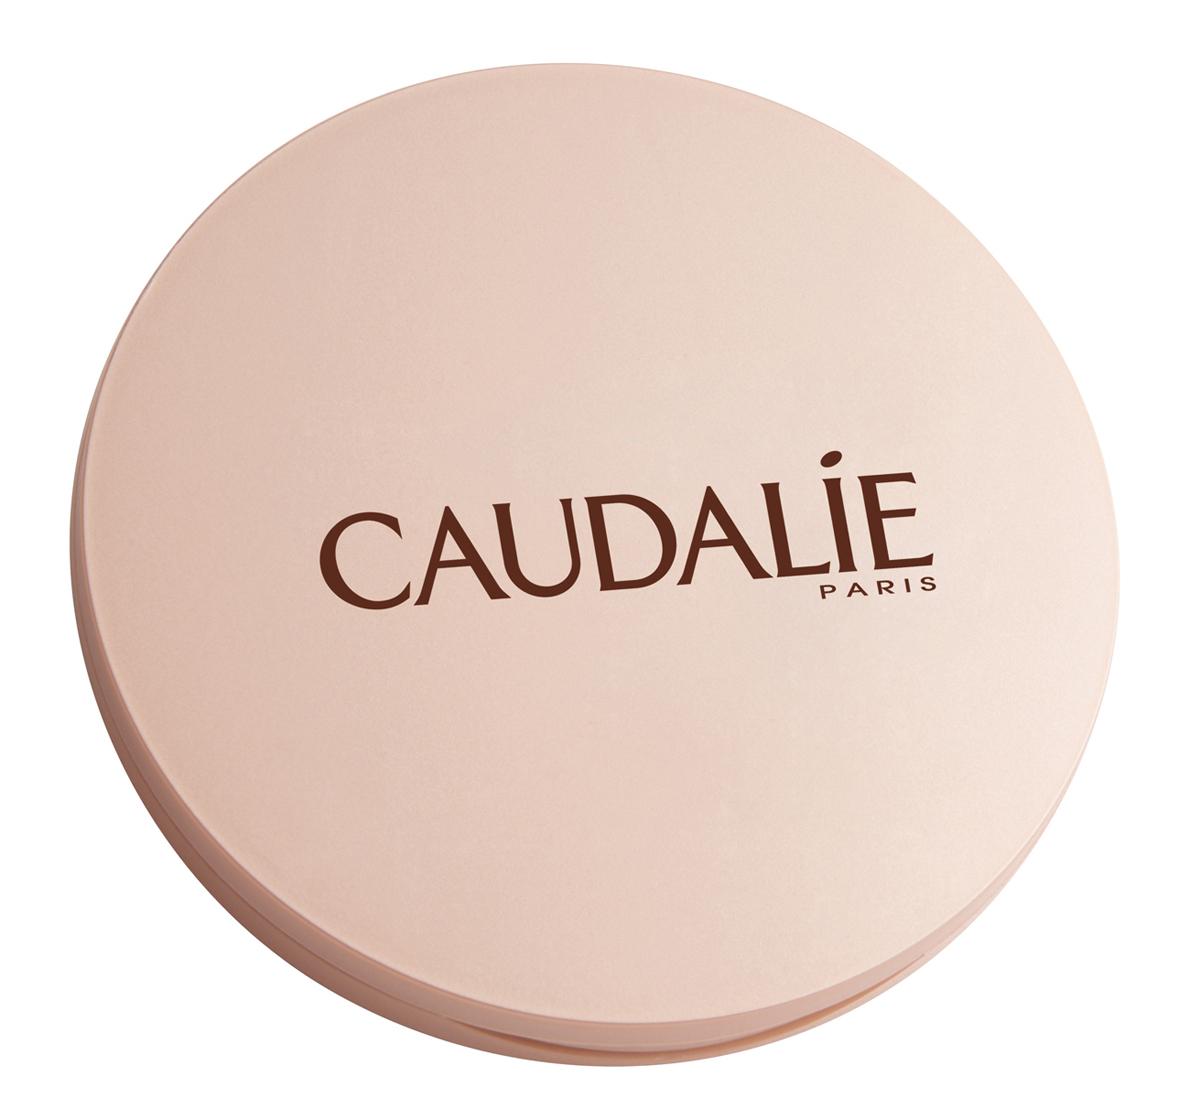 Caudalie Минеральная пудра Красивая кожа Divine range, 10 гр